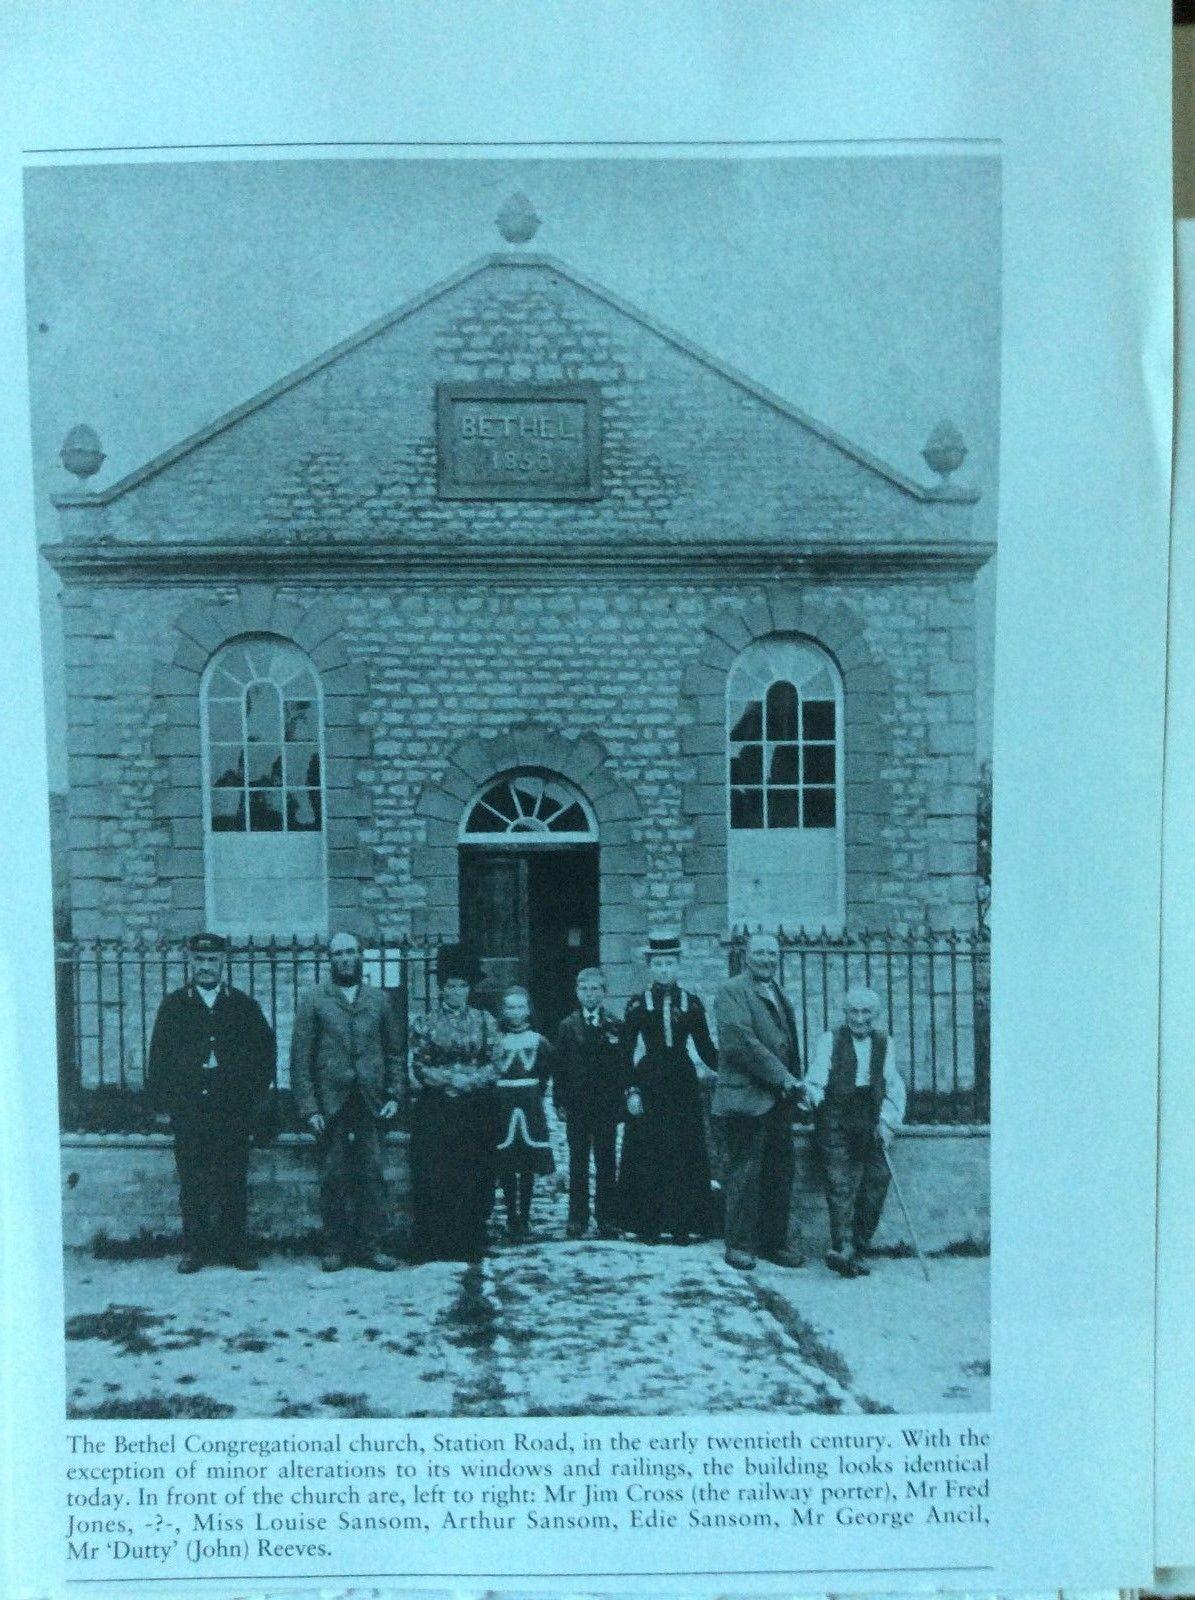 f1l ephemera reprint picture bicester bethel congregational church louise sansom | eBay